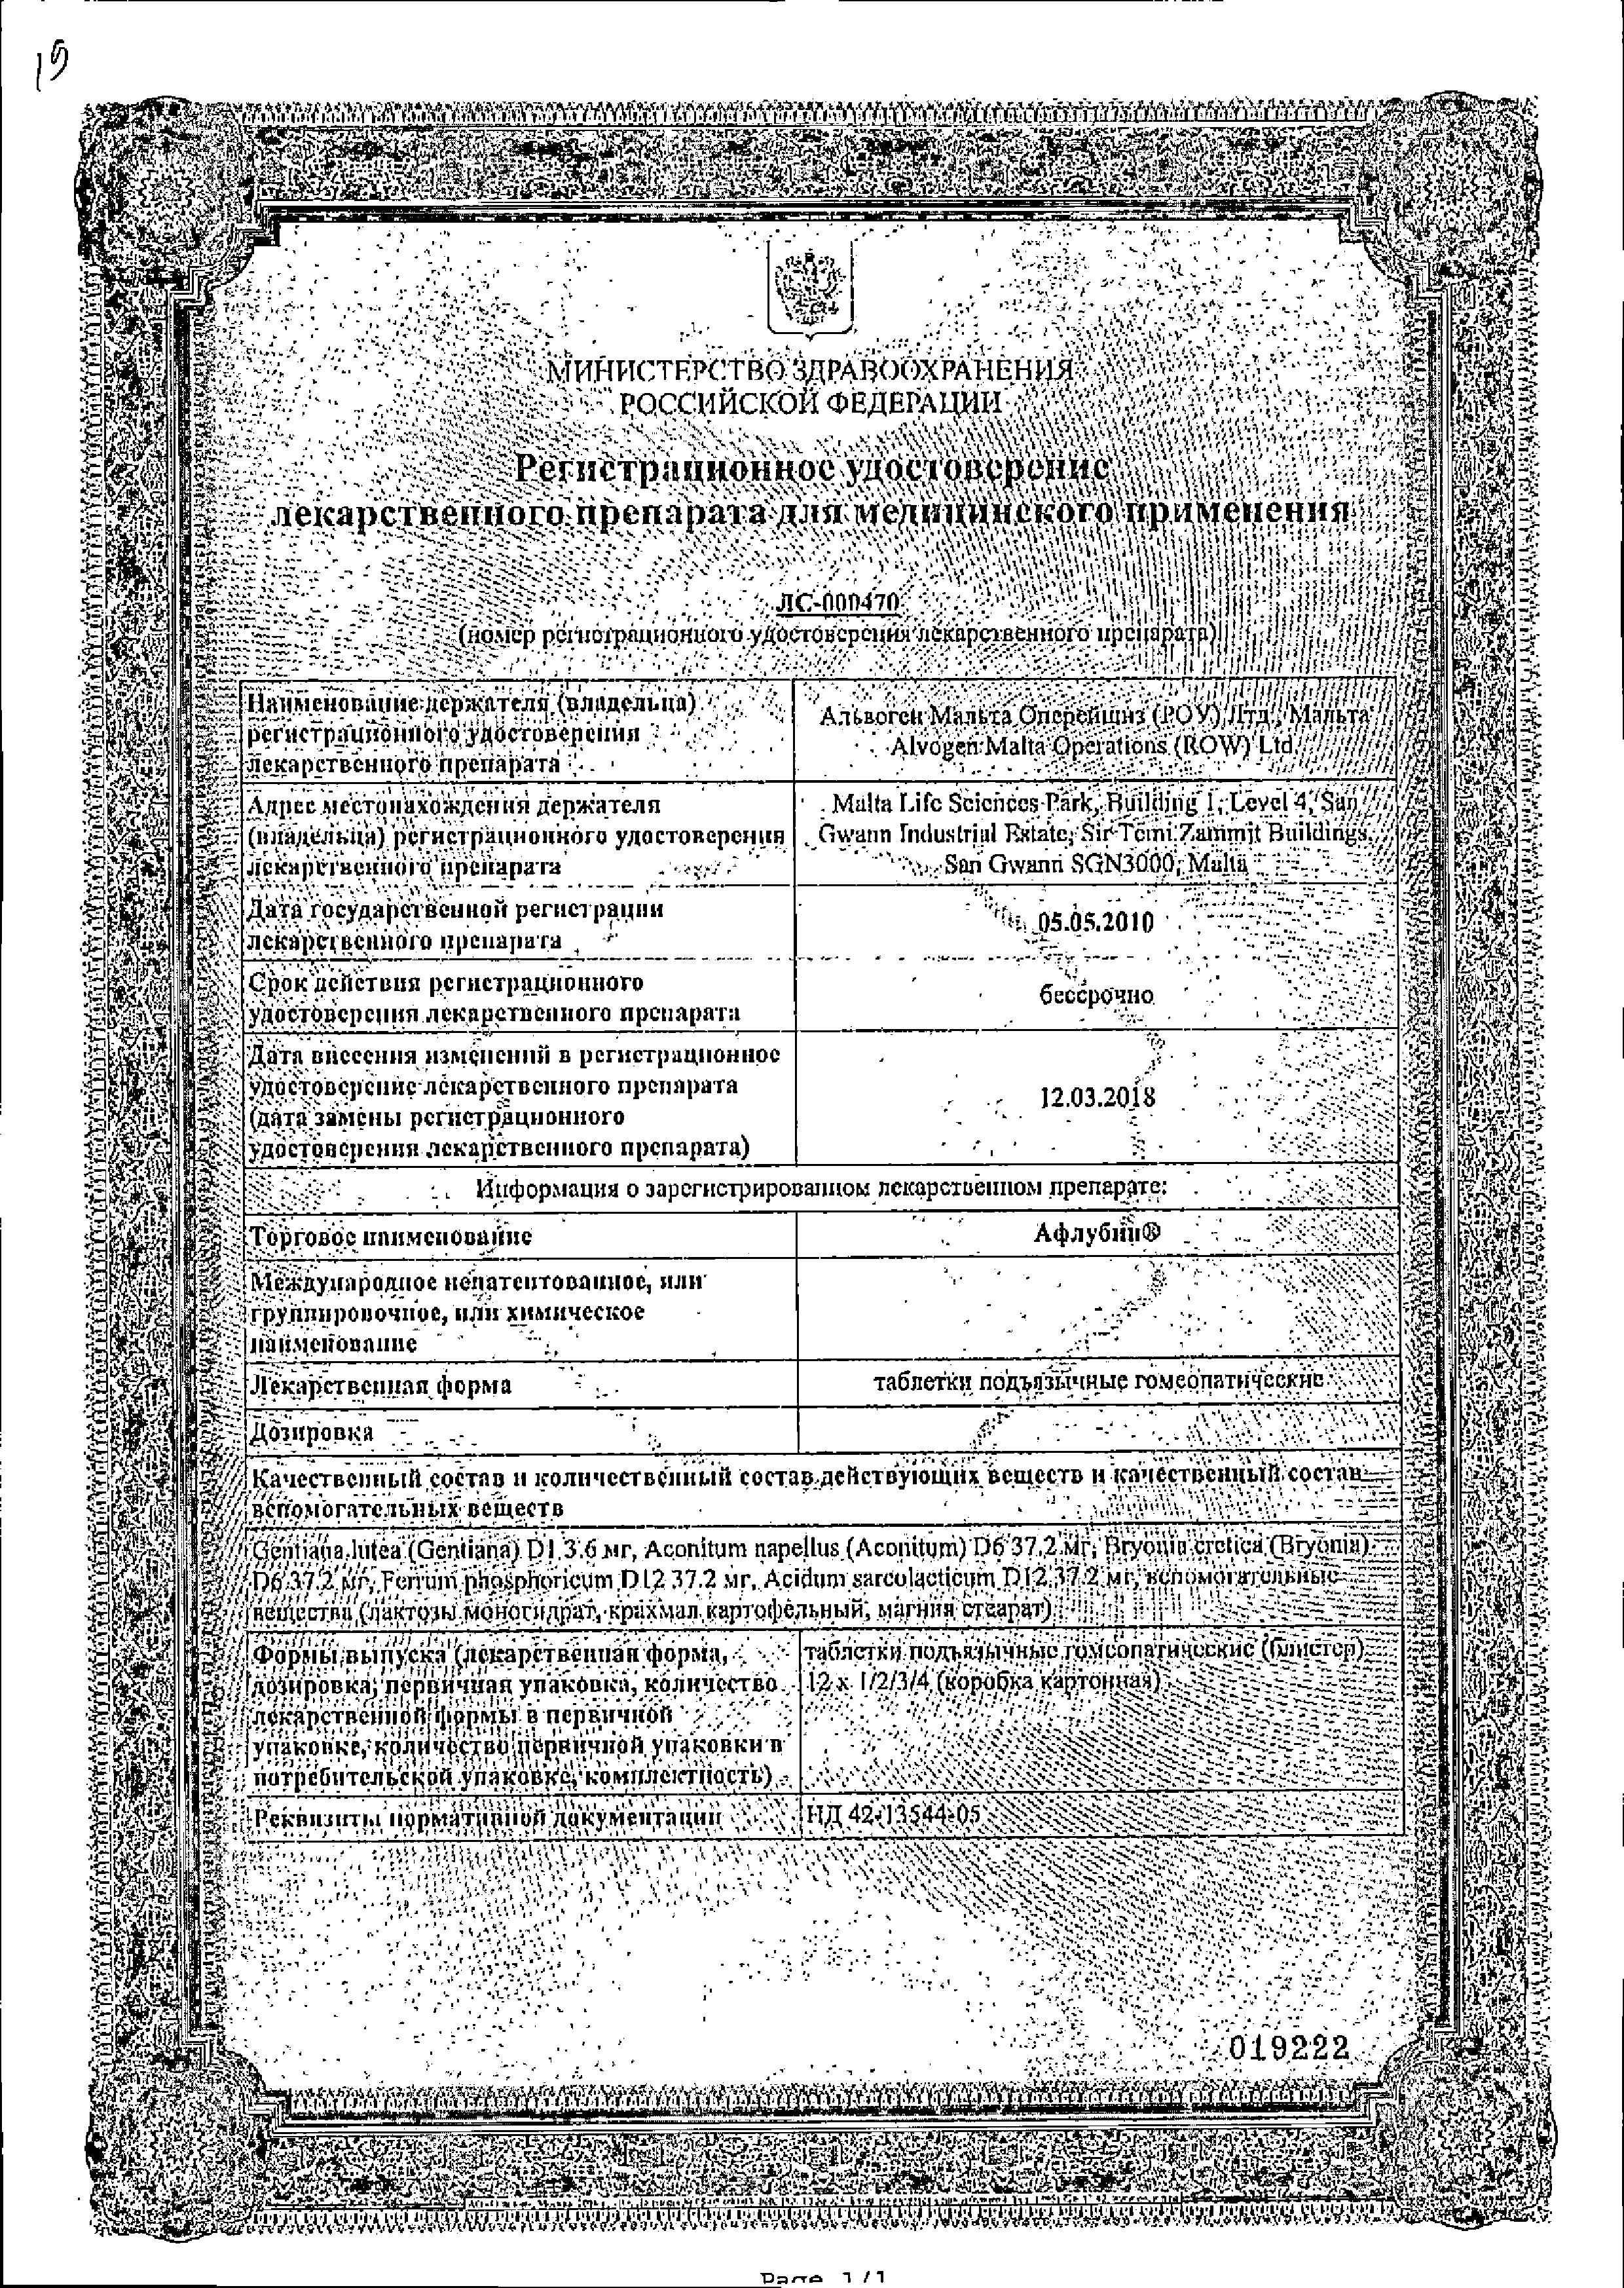 Афлубин сертификат